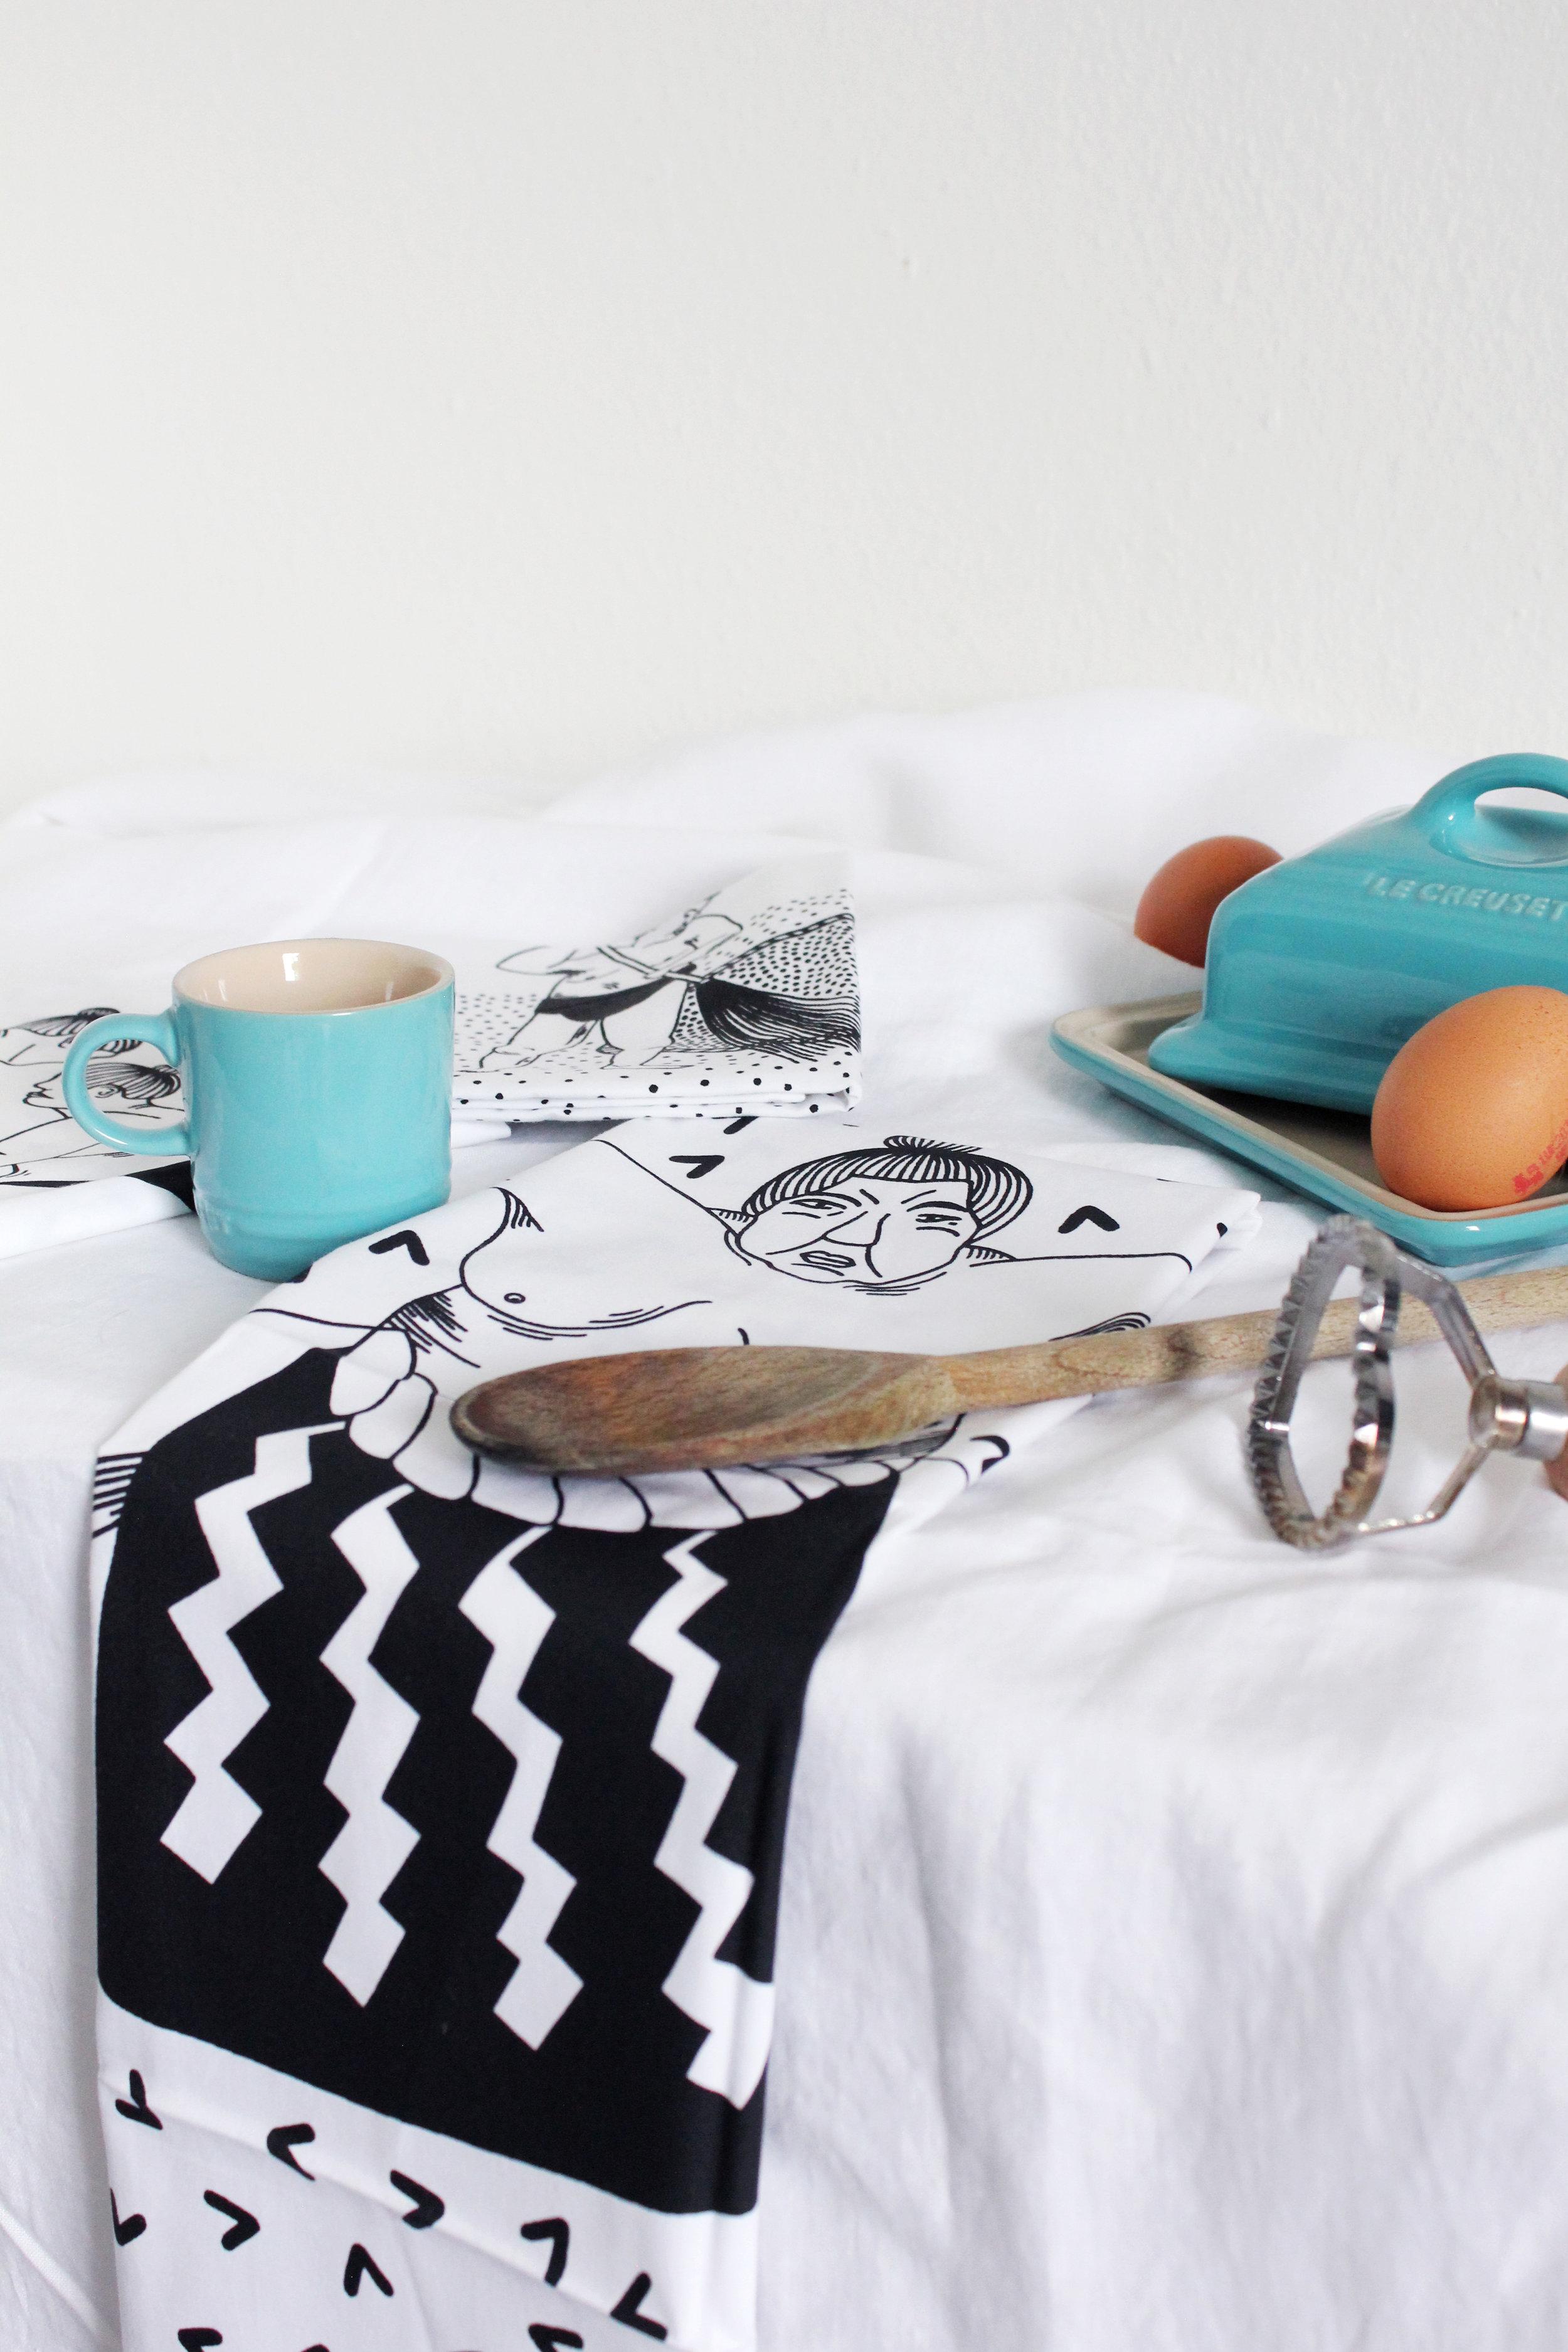 Sumo Tea Towel 11 Postcards Home Callie Pettigrew.jpg